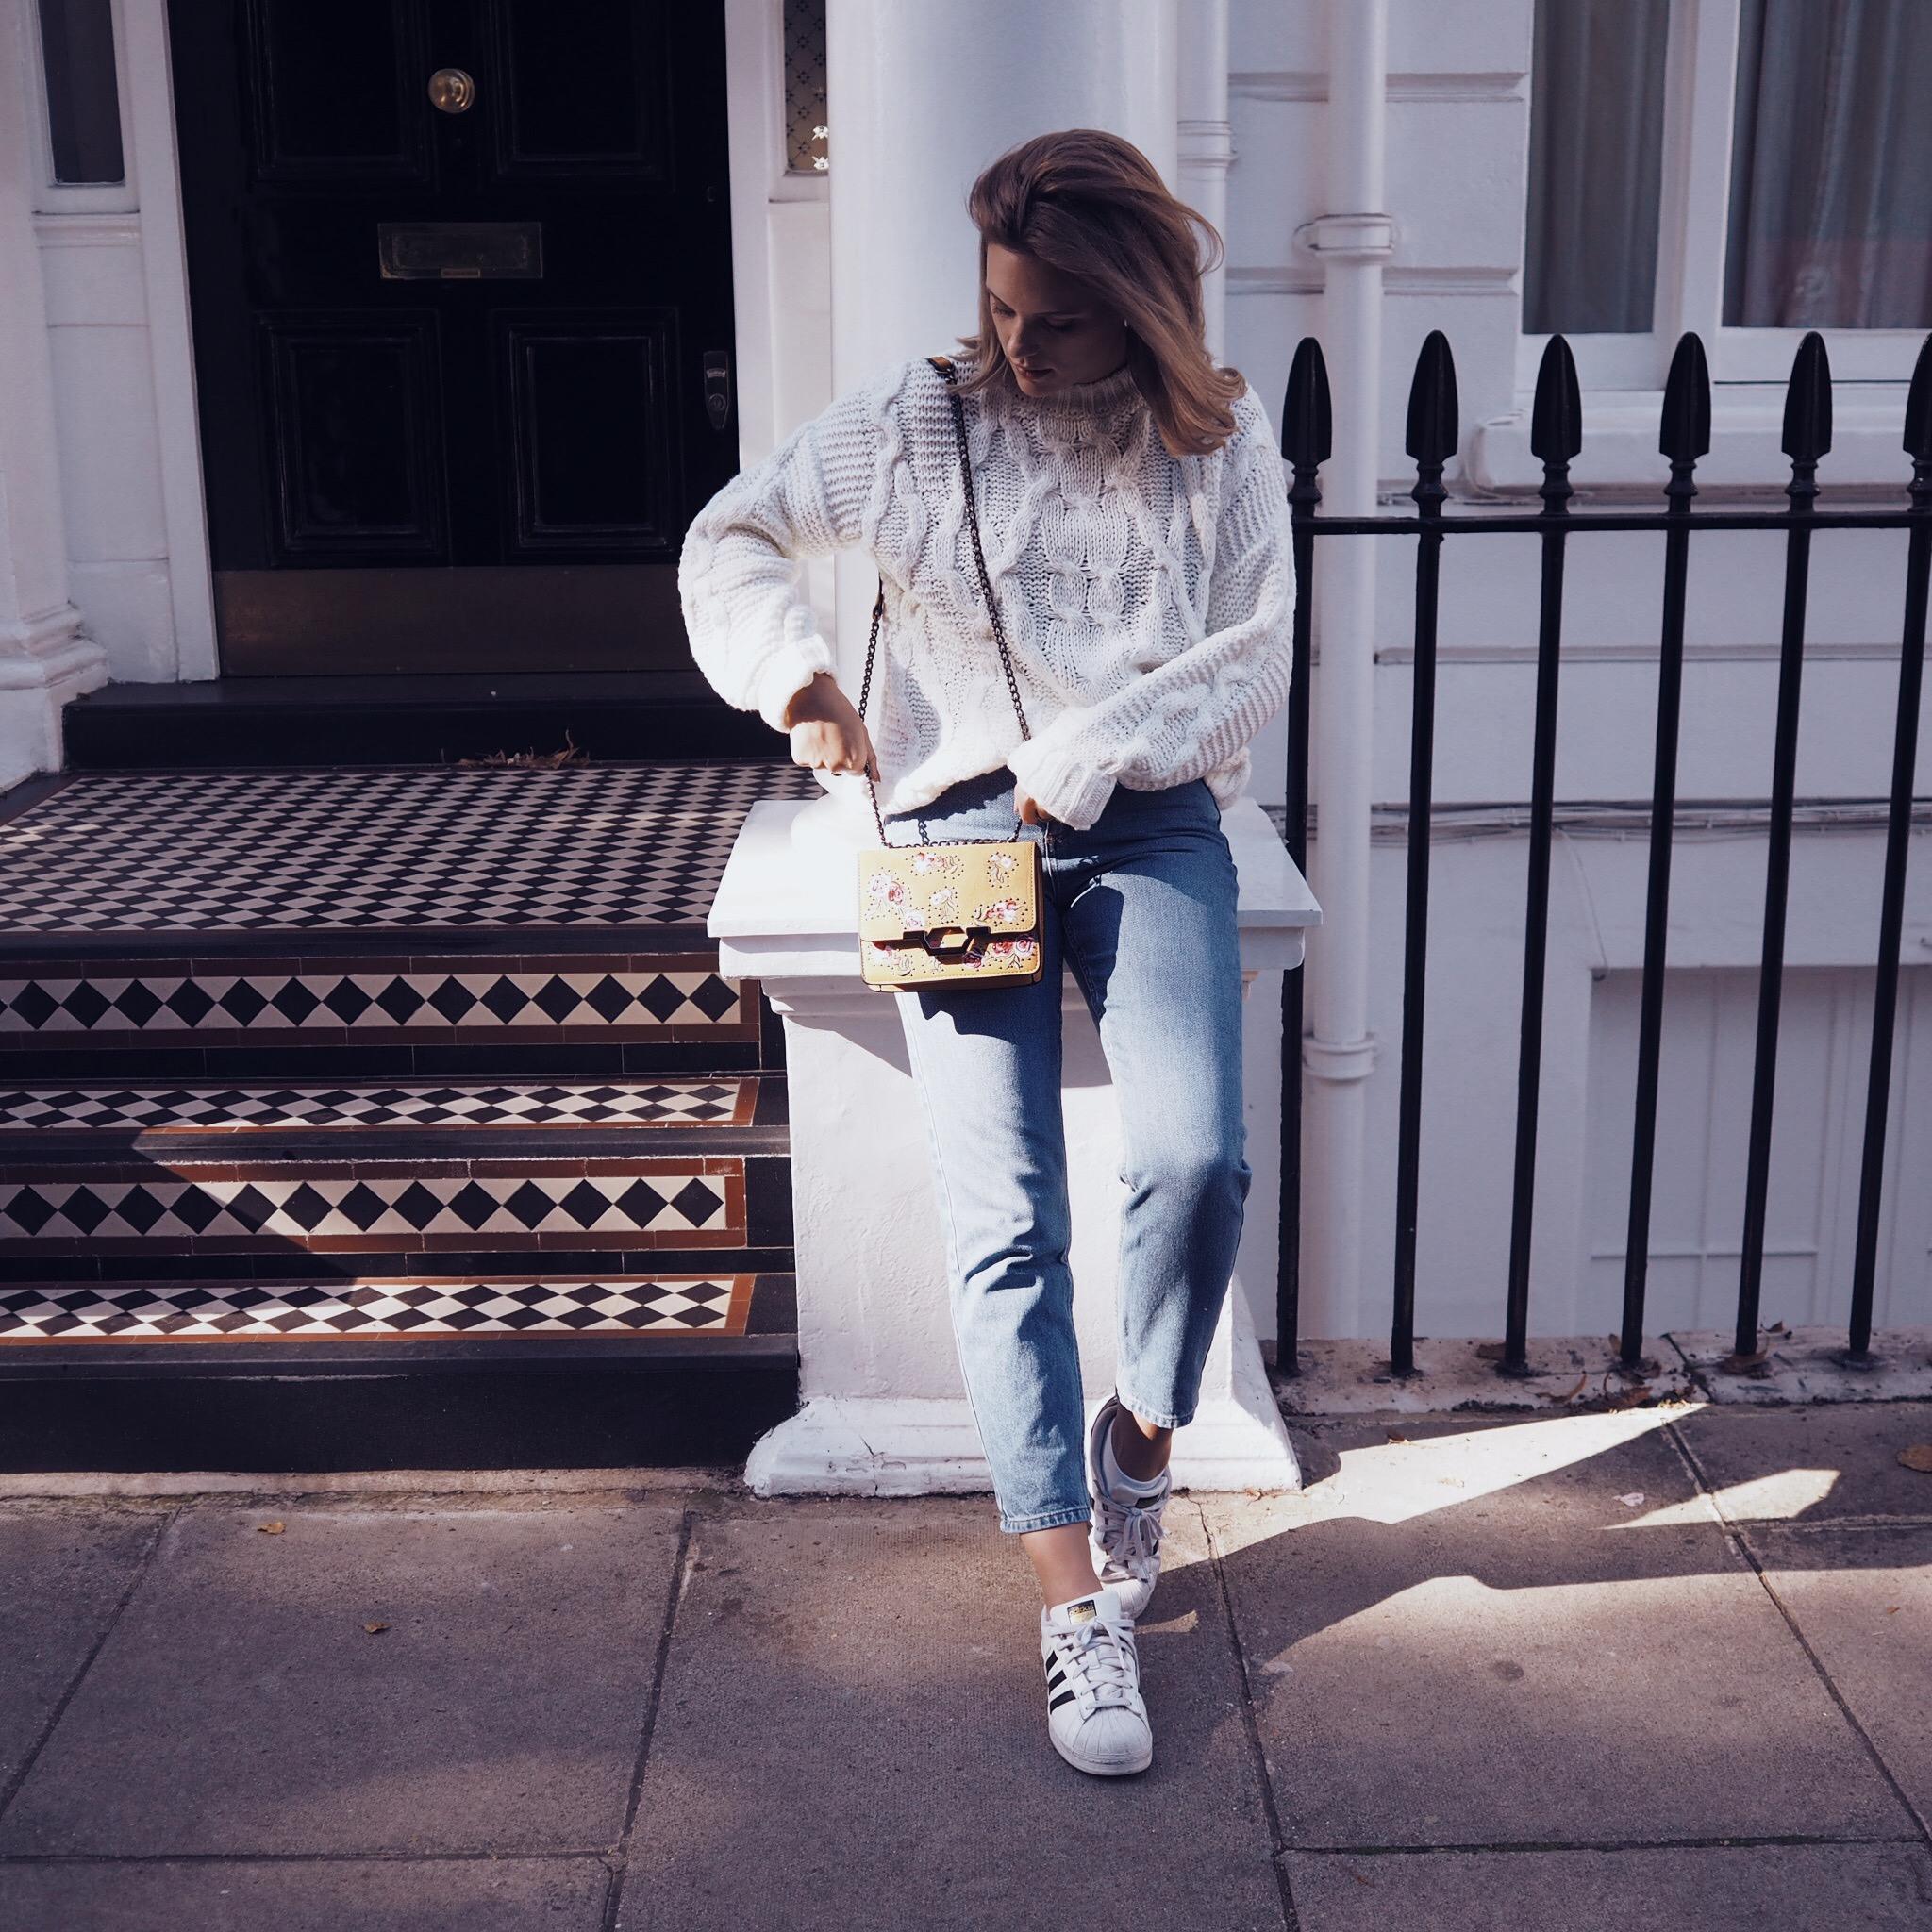 Cocoa Chelsea Outfit post jesschamilton the good life miss selfridge